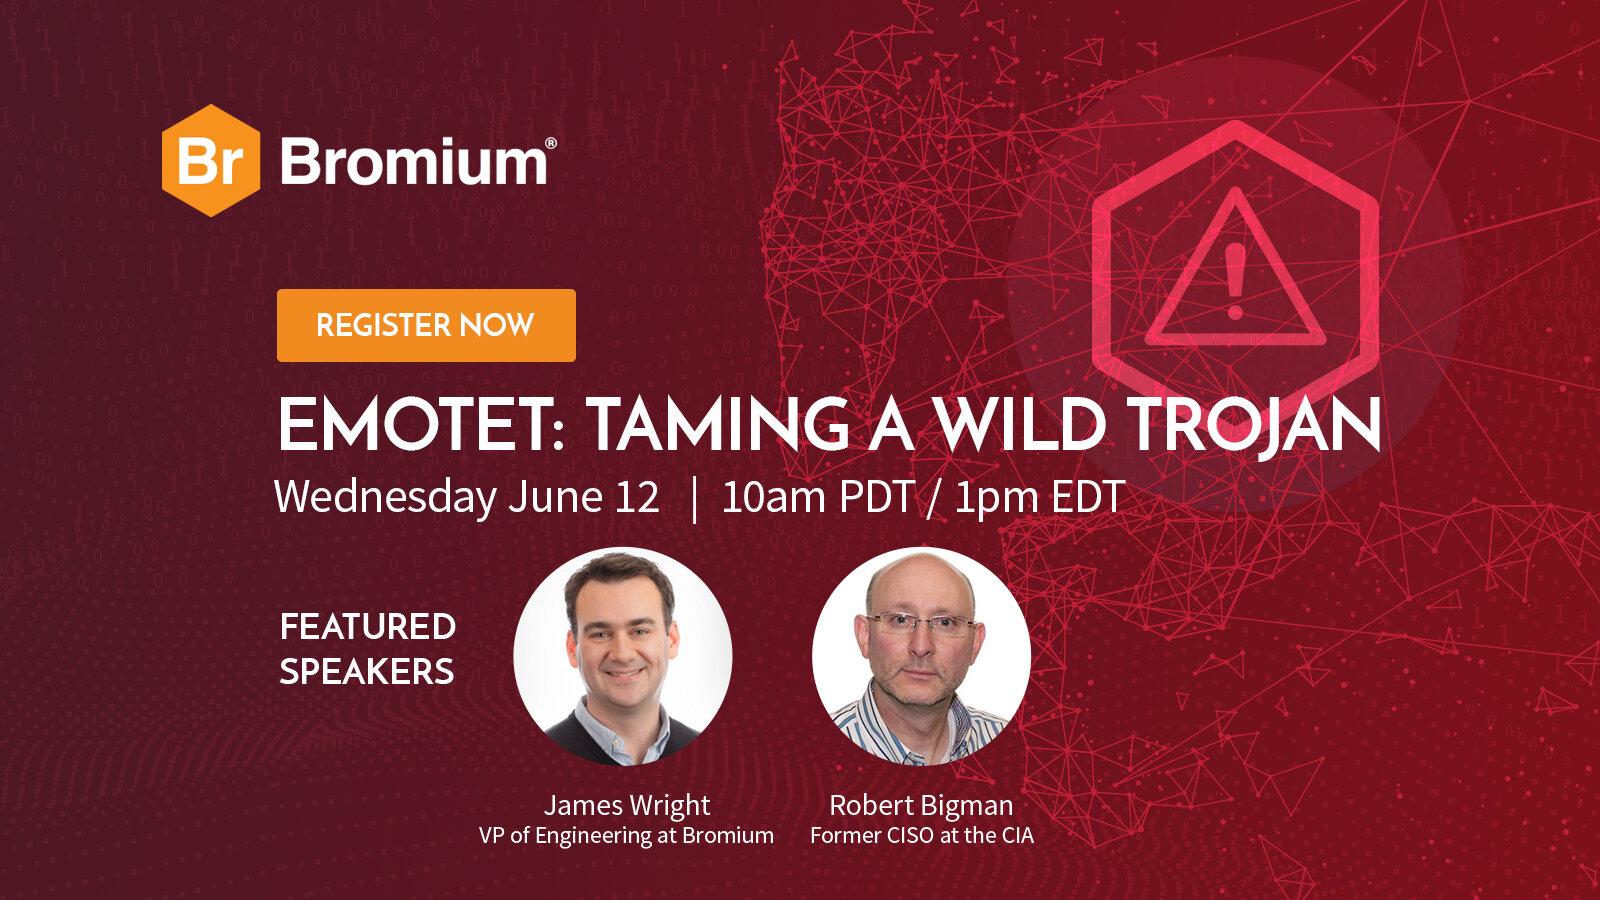 Bromium-Emotet-Webinar-SMV4.jpg